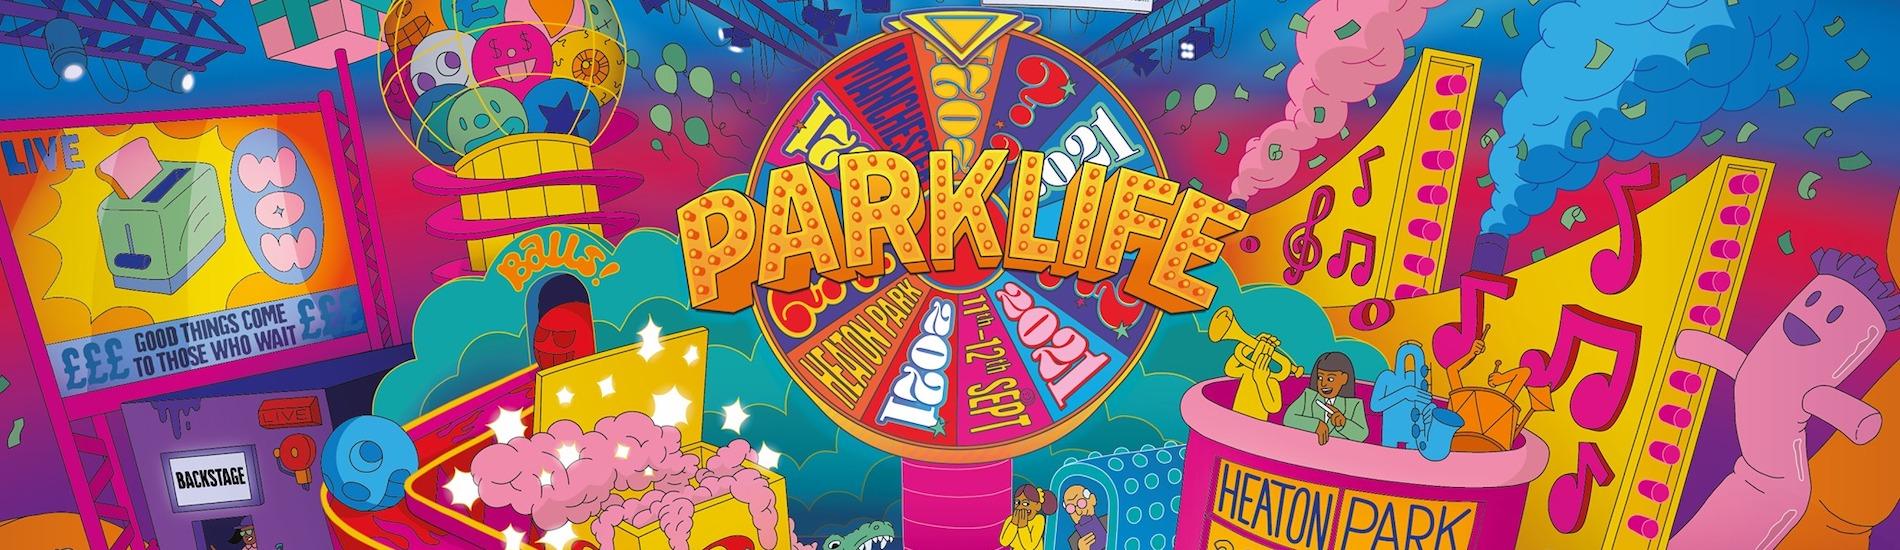 Parklife 2021